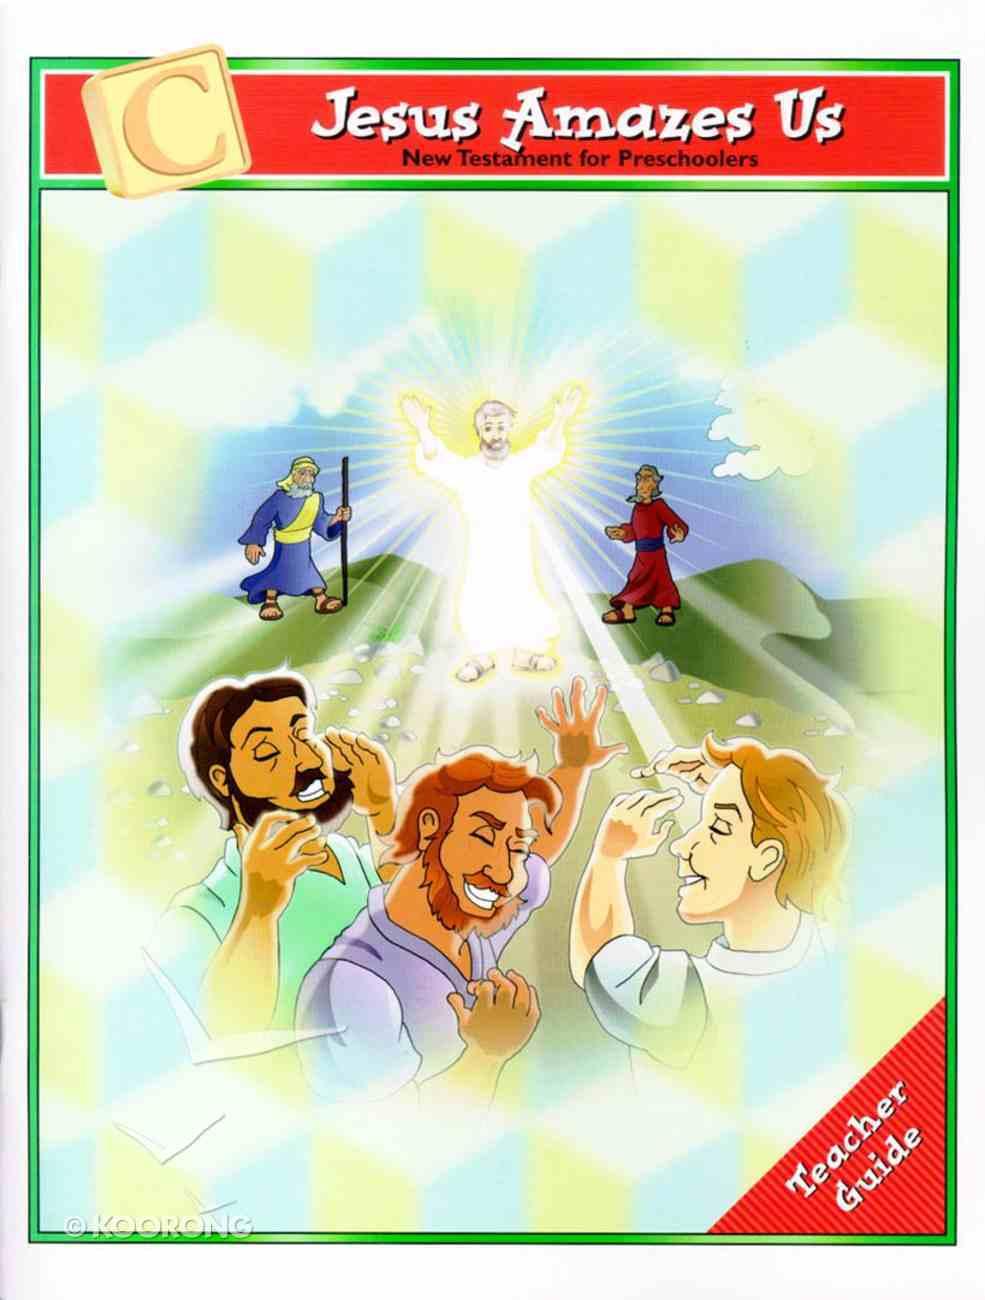 Dlc Preschool: NT, Unit C Ages 2-5 (Teacher) (Discipleland Preschool, Ages 3-5 Series) Paperback